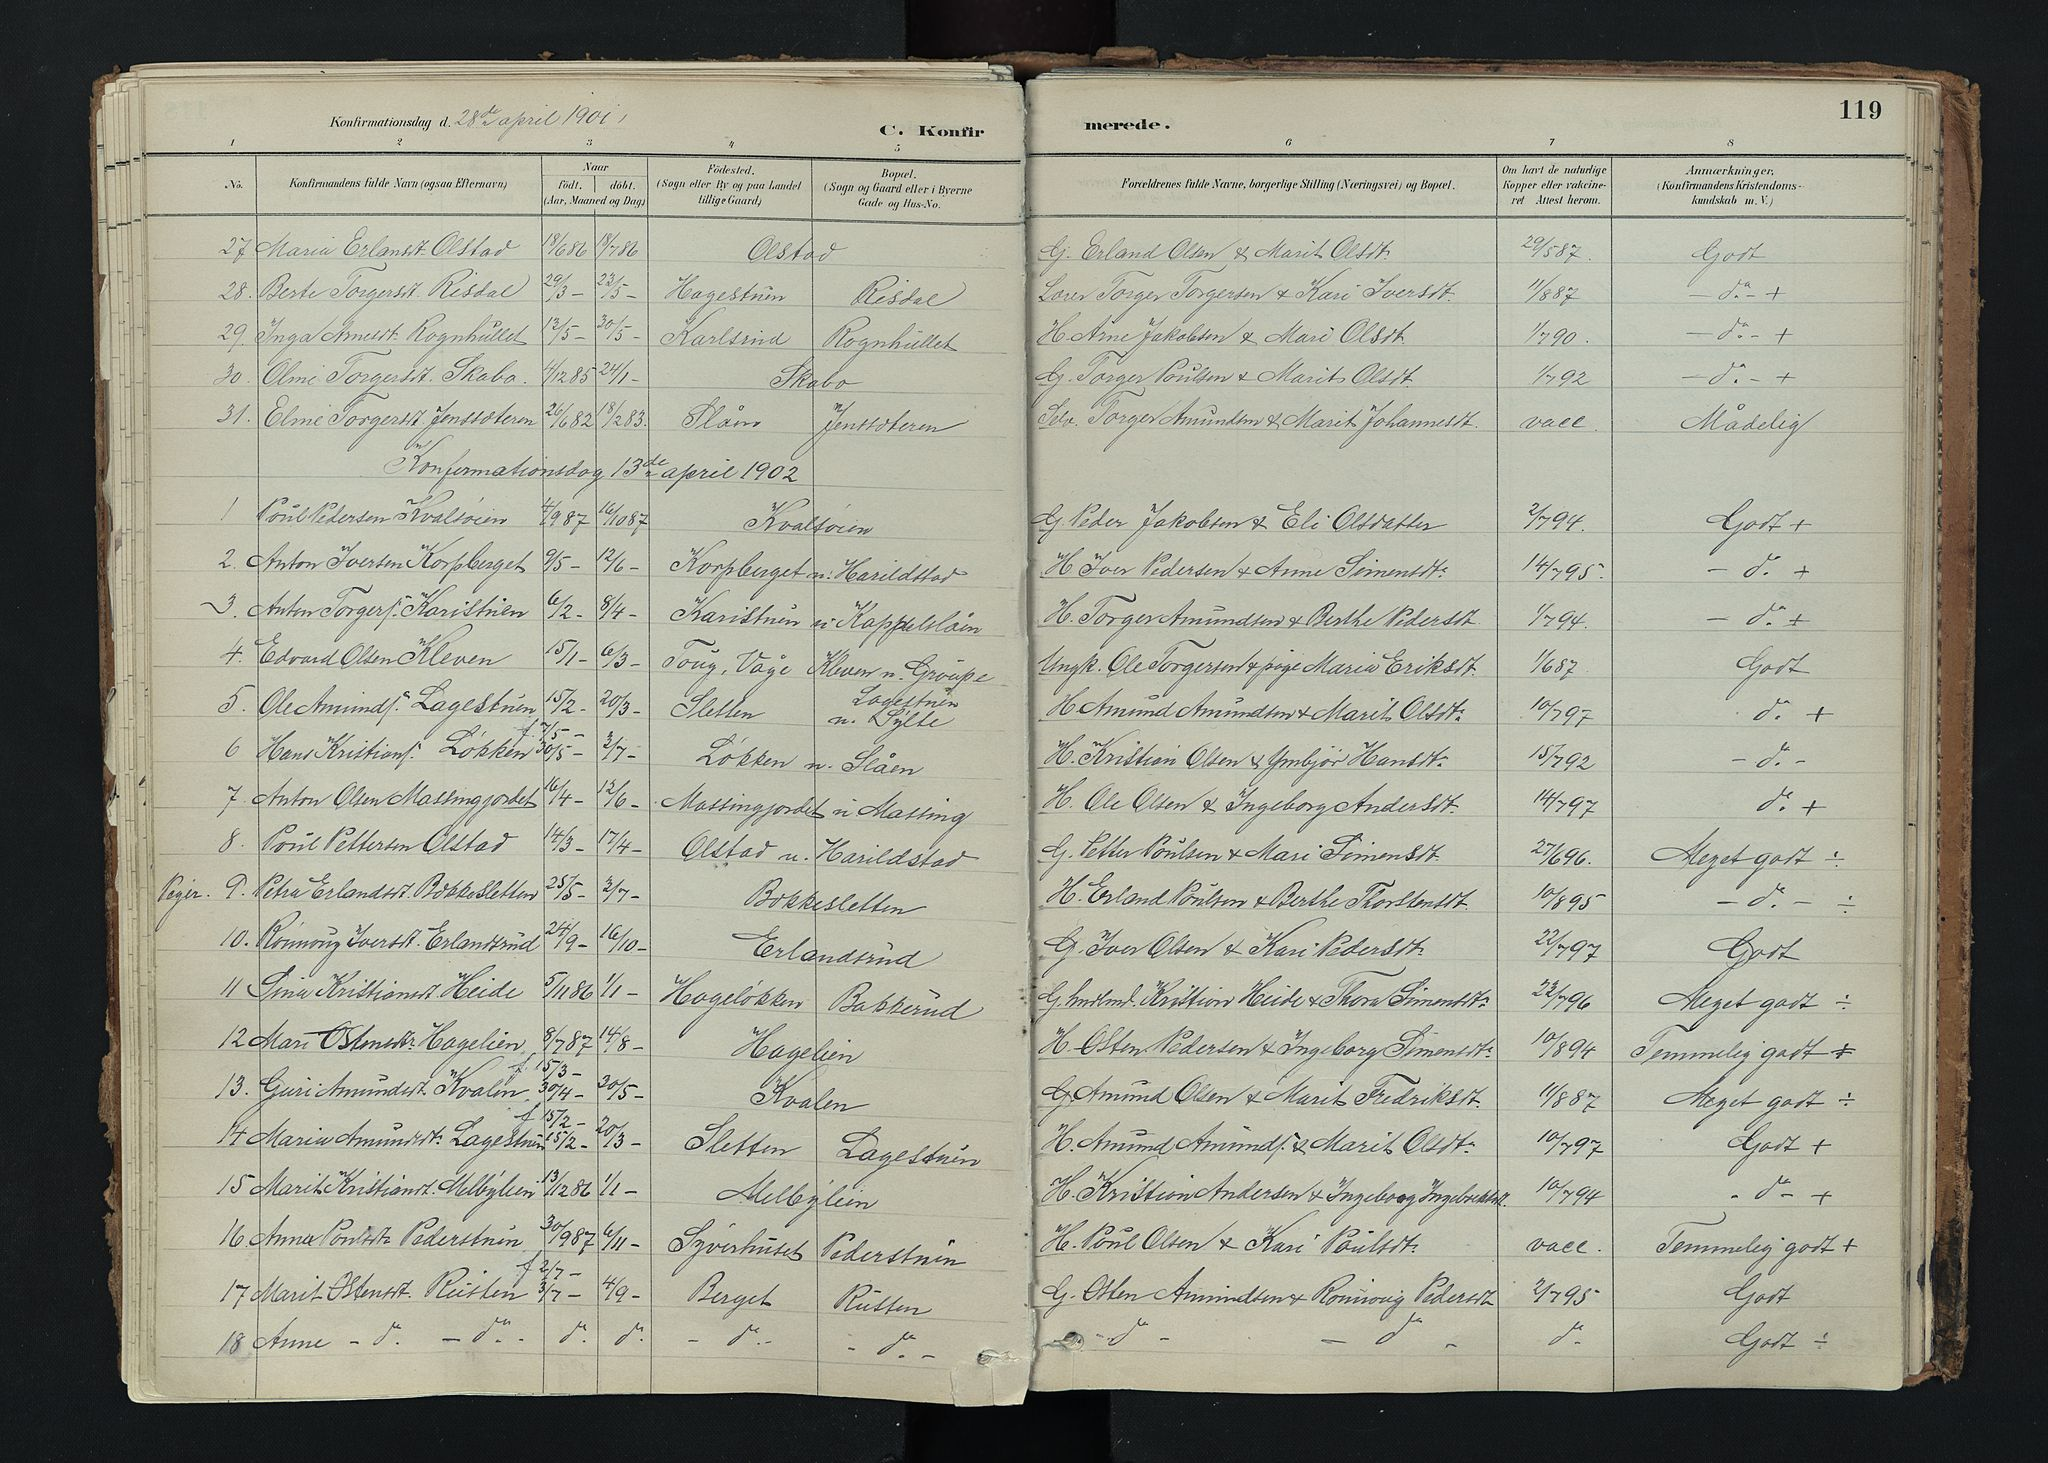 SAH, Nord-Fron prestekontor, Ministerialbok nr. 5, 1884-1914, s. 119